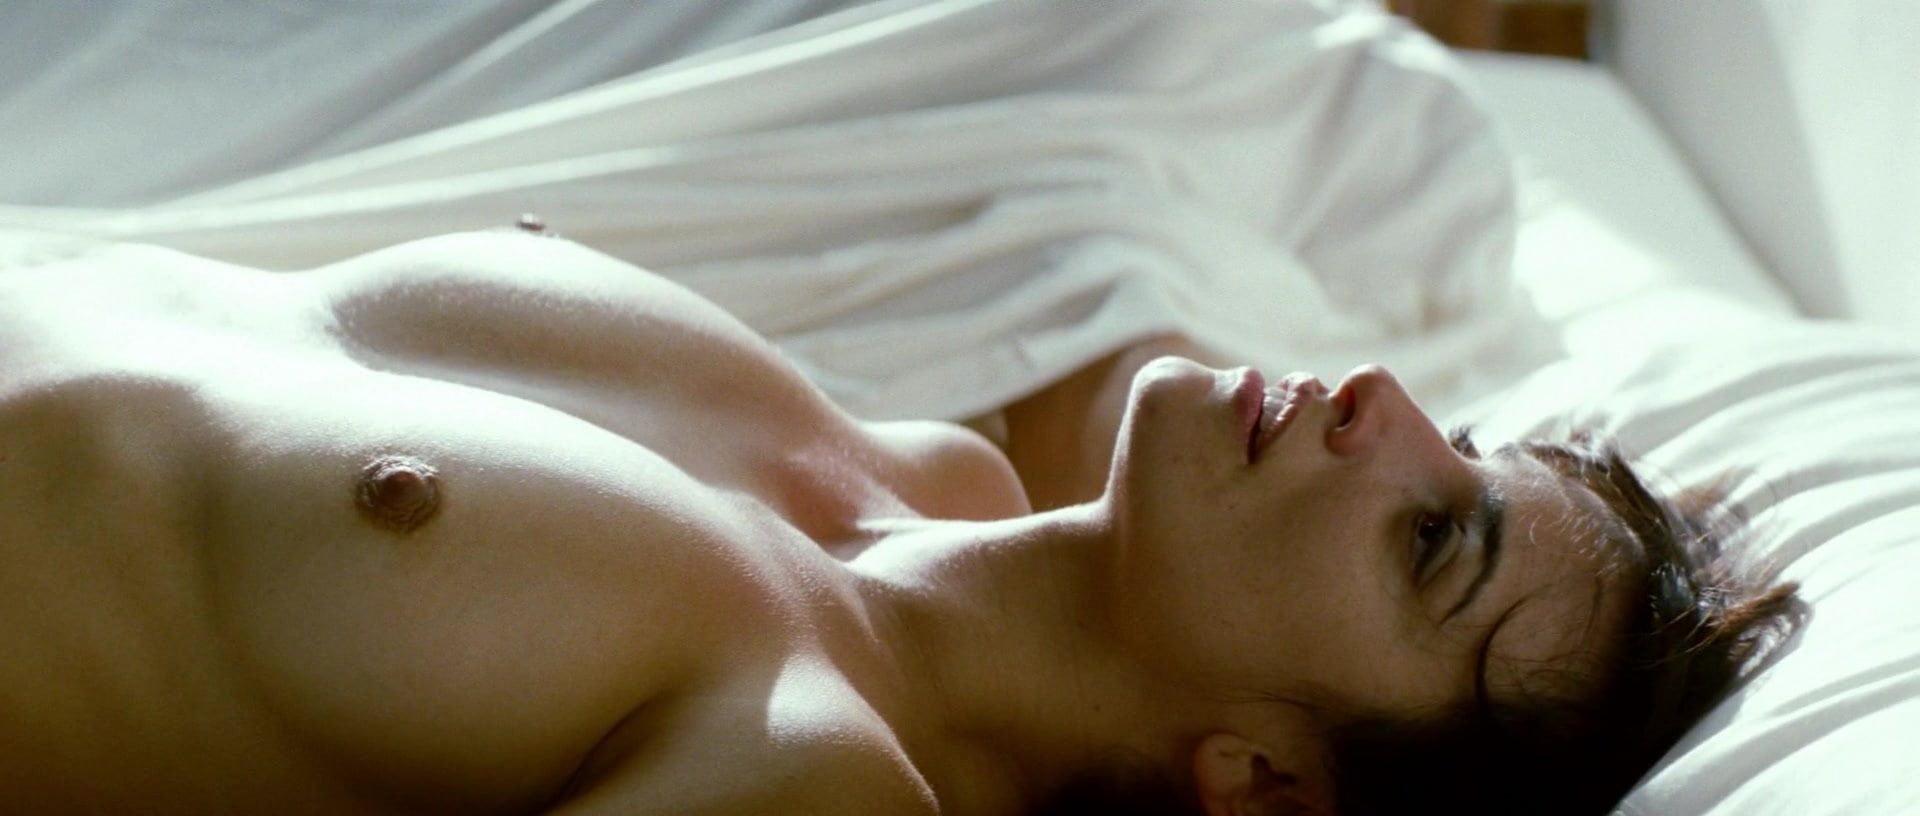 Penelope cruz fucked hard, sexy petite michelle nude